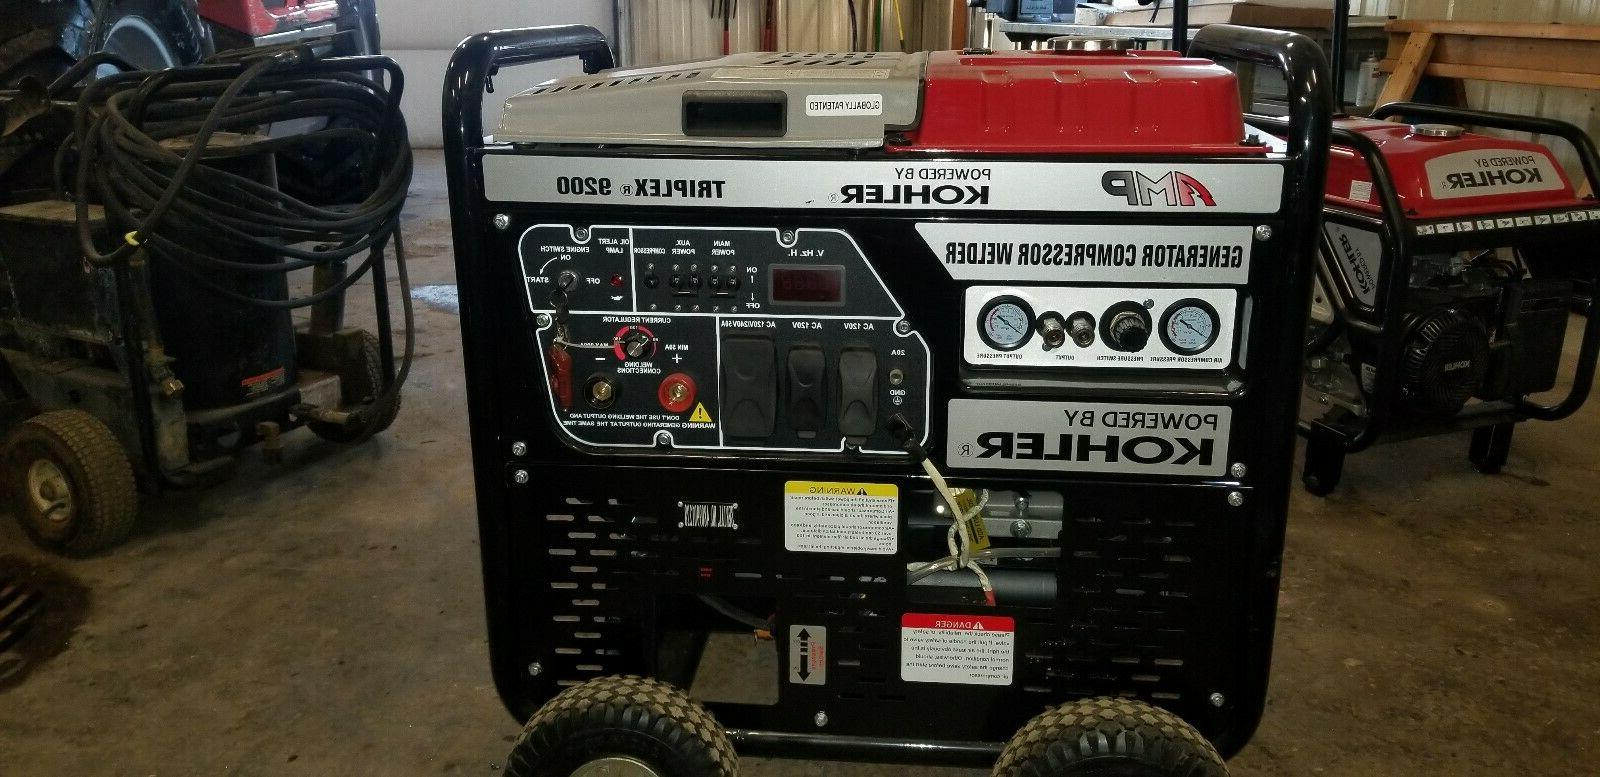 amp triplex 9200 3 in 1 generator